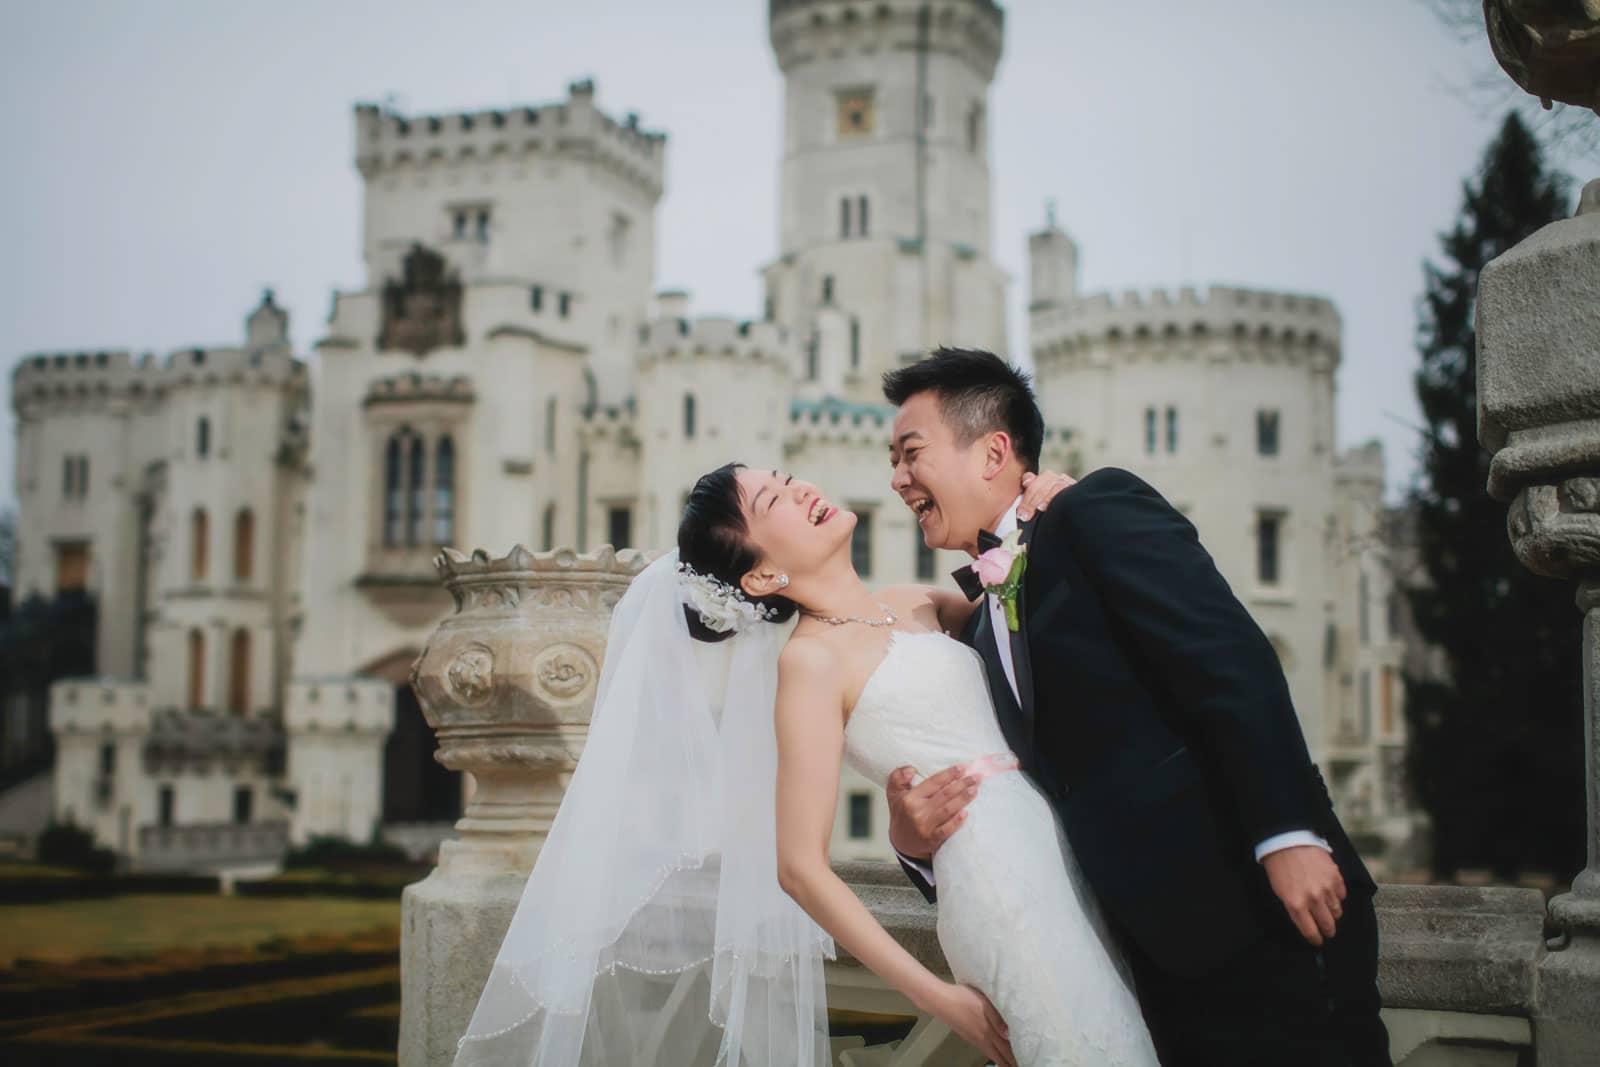 Castle Hluboka nad Vltavou wedding / Suki & Steven / photography